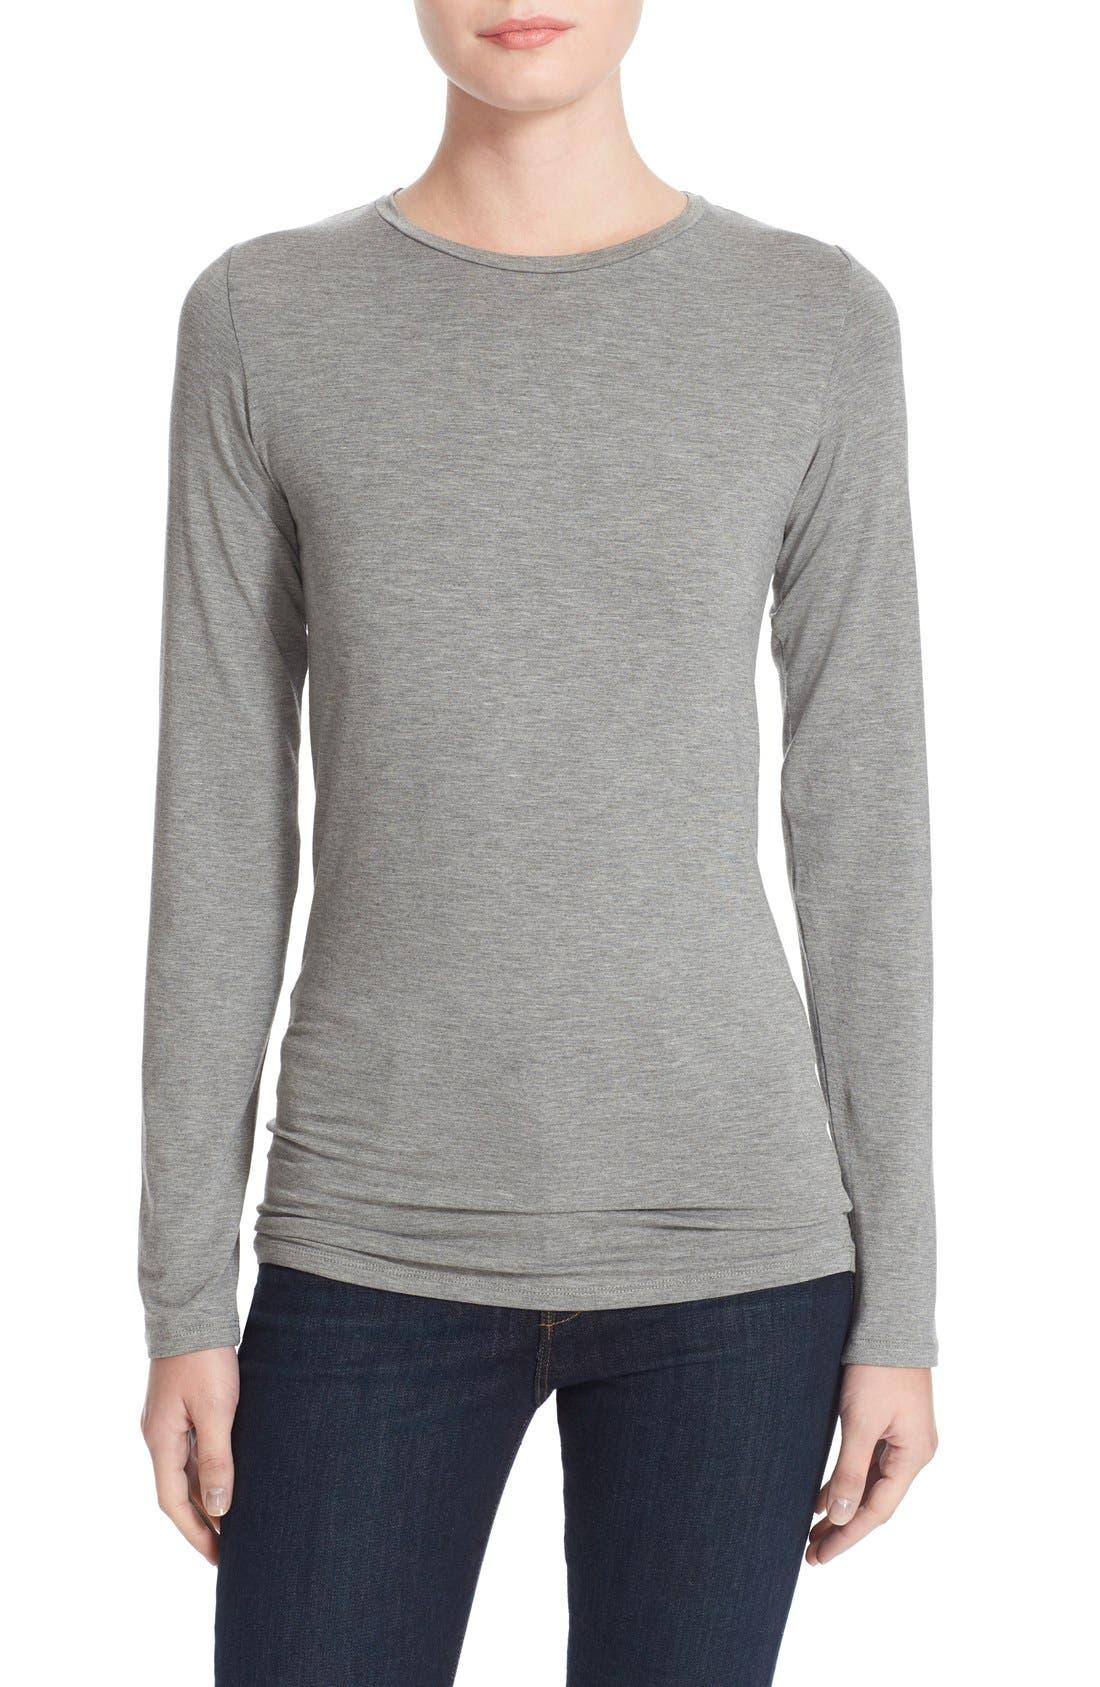 Majestic Filatures Woman Lace-up Cotton-blend Sweatshirt Dark Gray Size 4 Majestic Filatures Cheap Sale Genuine r2wwGiVpk